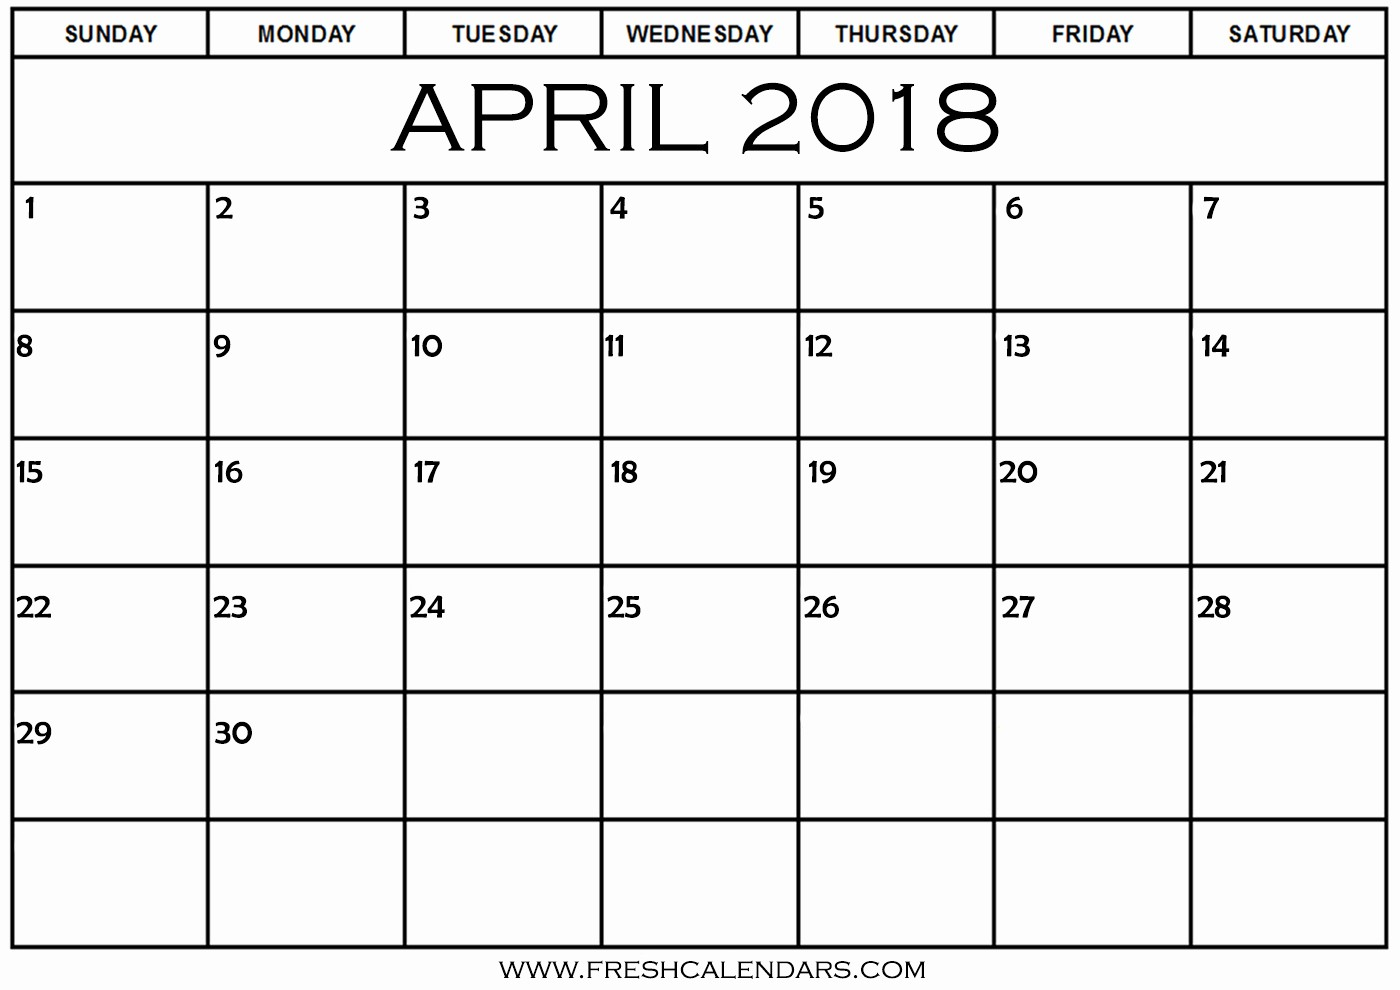 Blank April 2018 Calendar Template Luxury Blank April 2018 Calendar Printable Templates